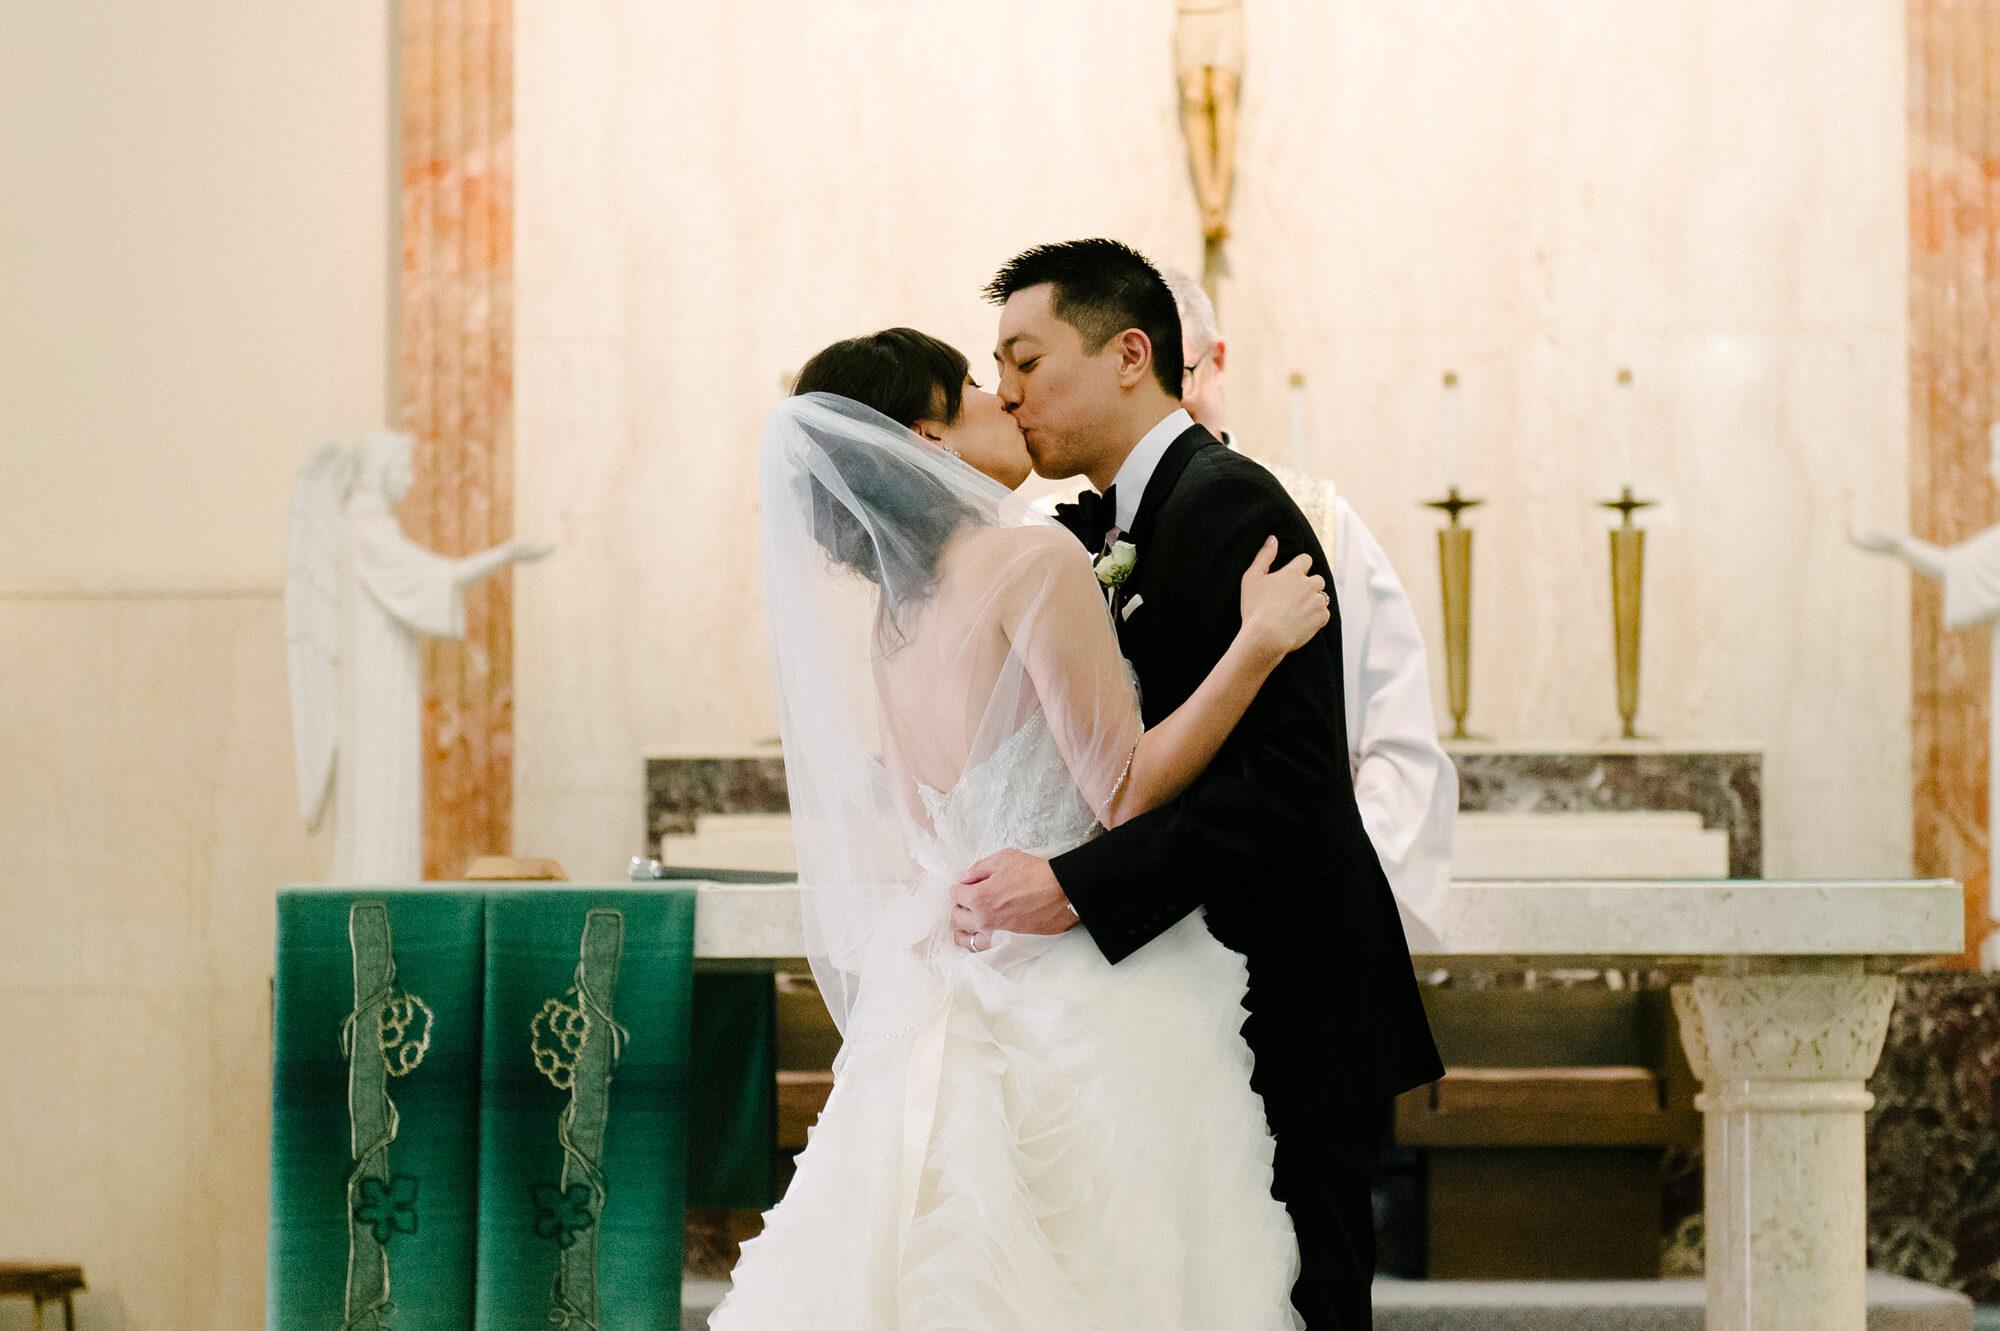 bride groom kiss catholic church wedding ceremony